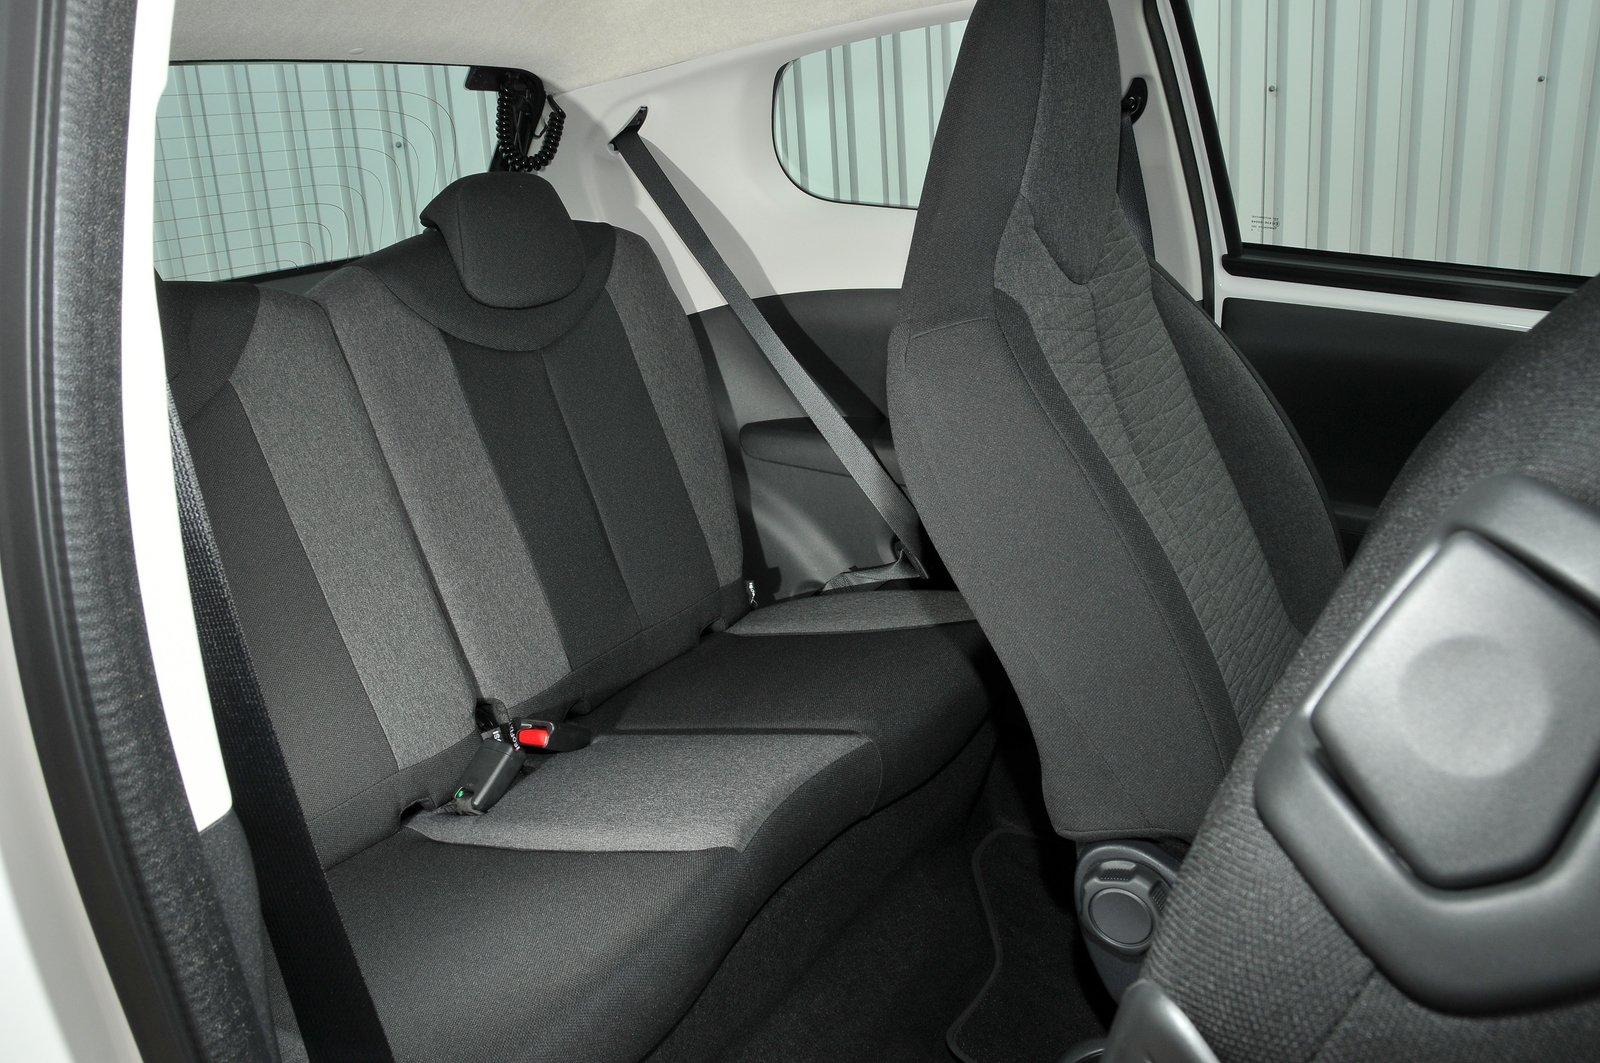 Citroën C1 2021 interior rear seats